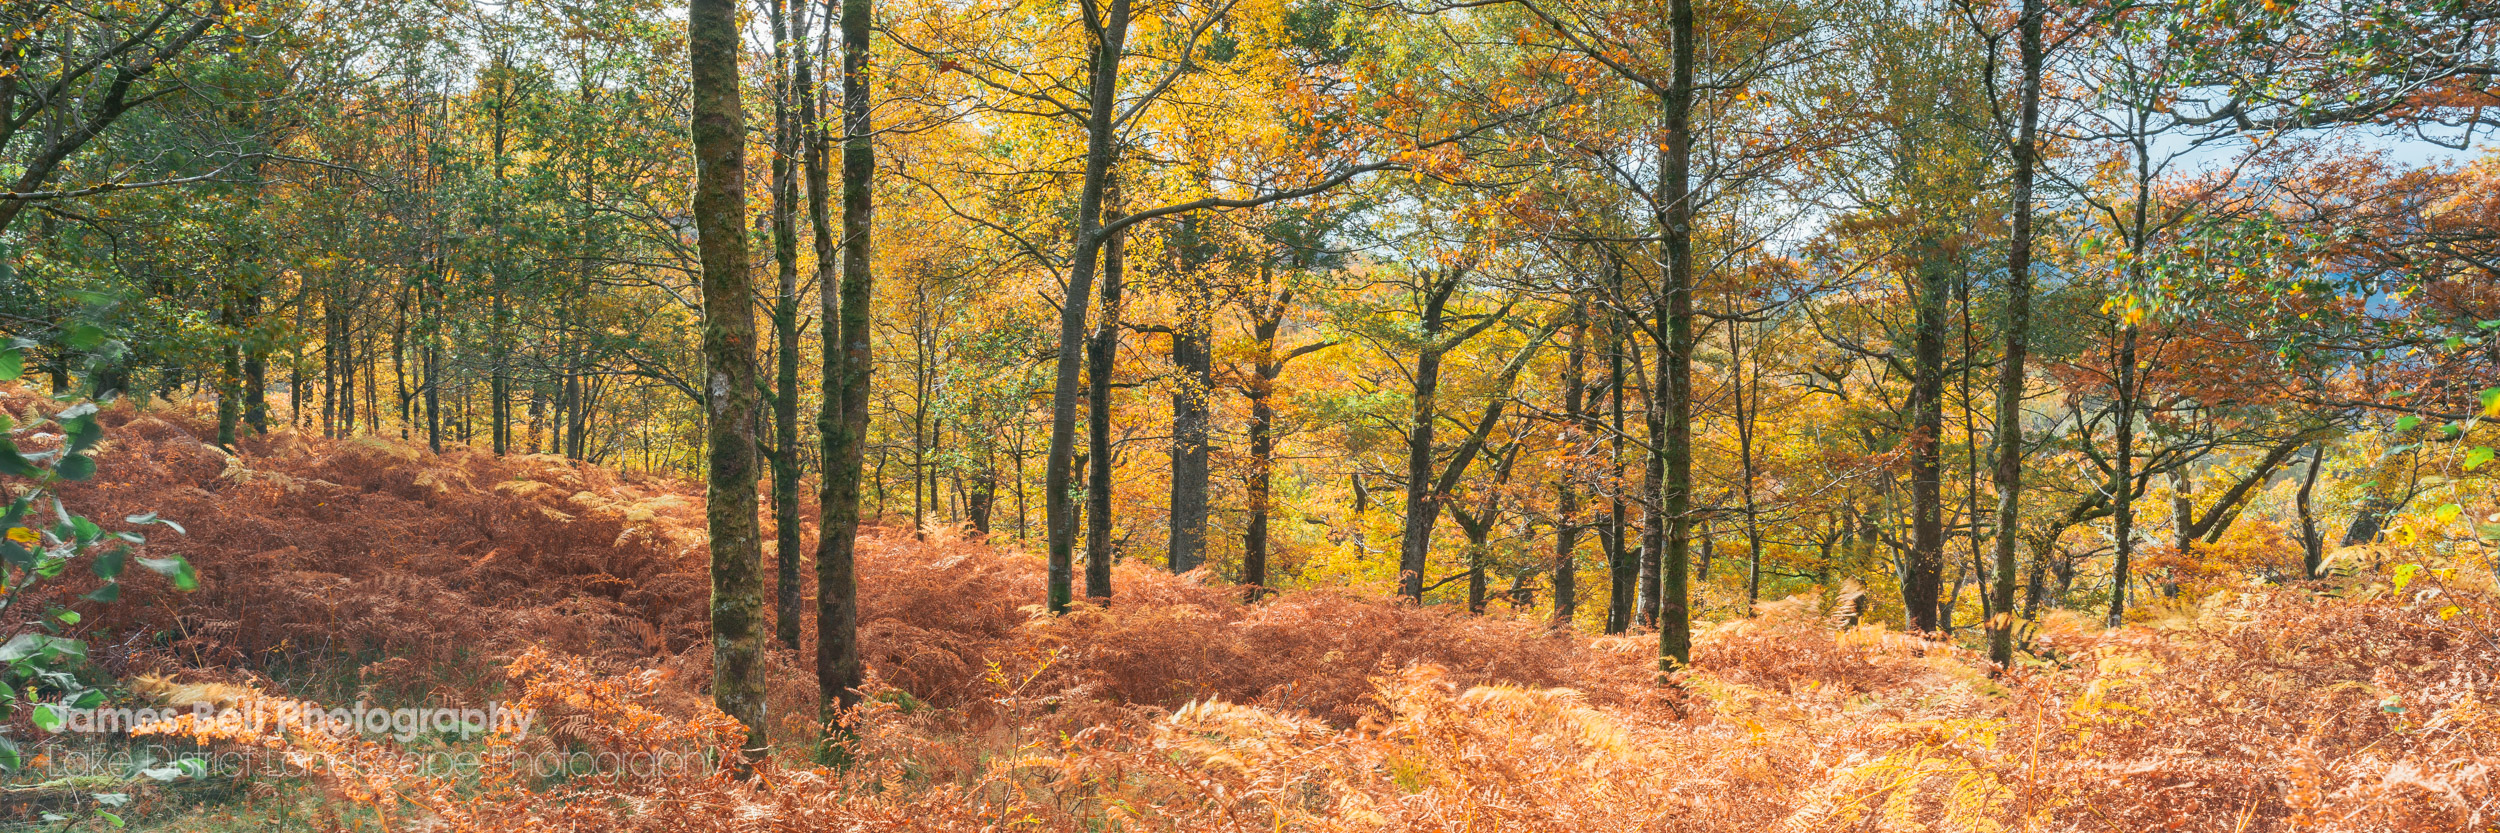 Borrowdale Autumn Woodland